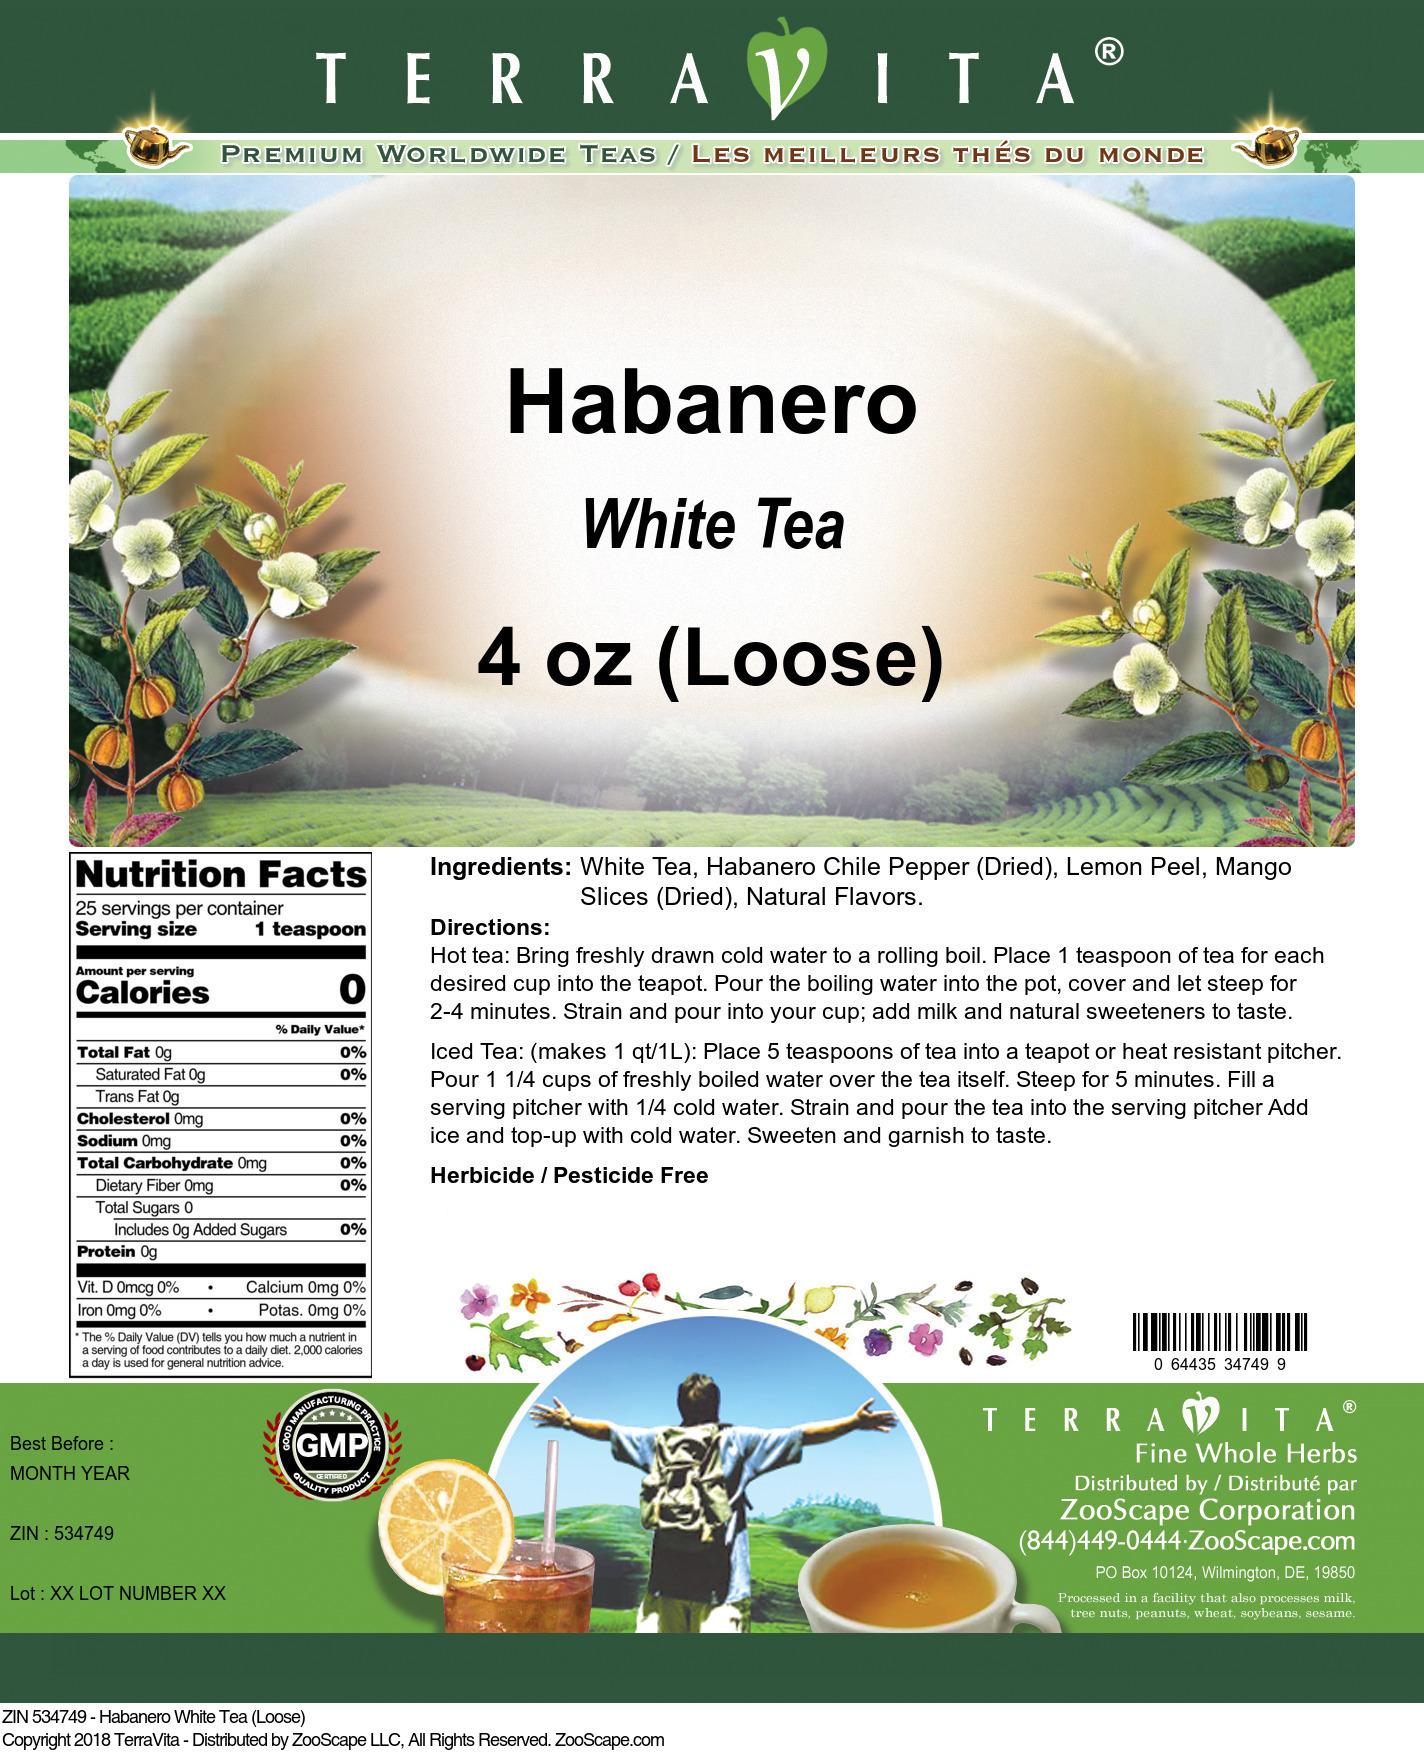 Habanero White Tea (Loose)